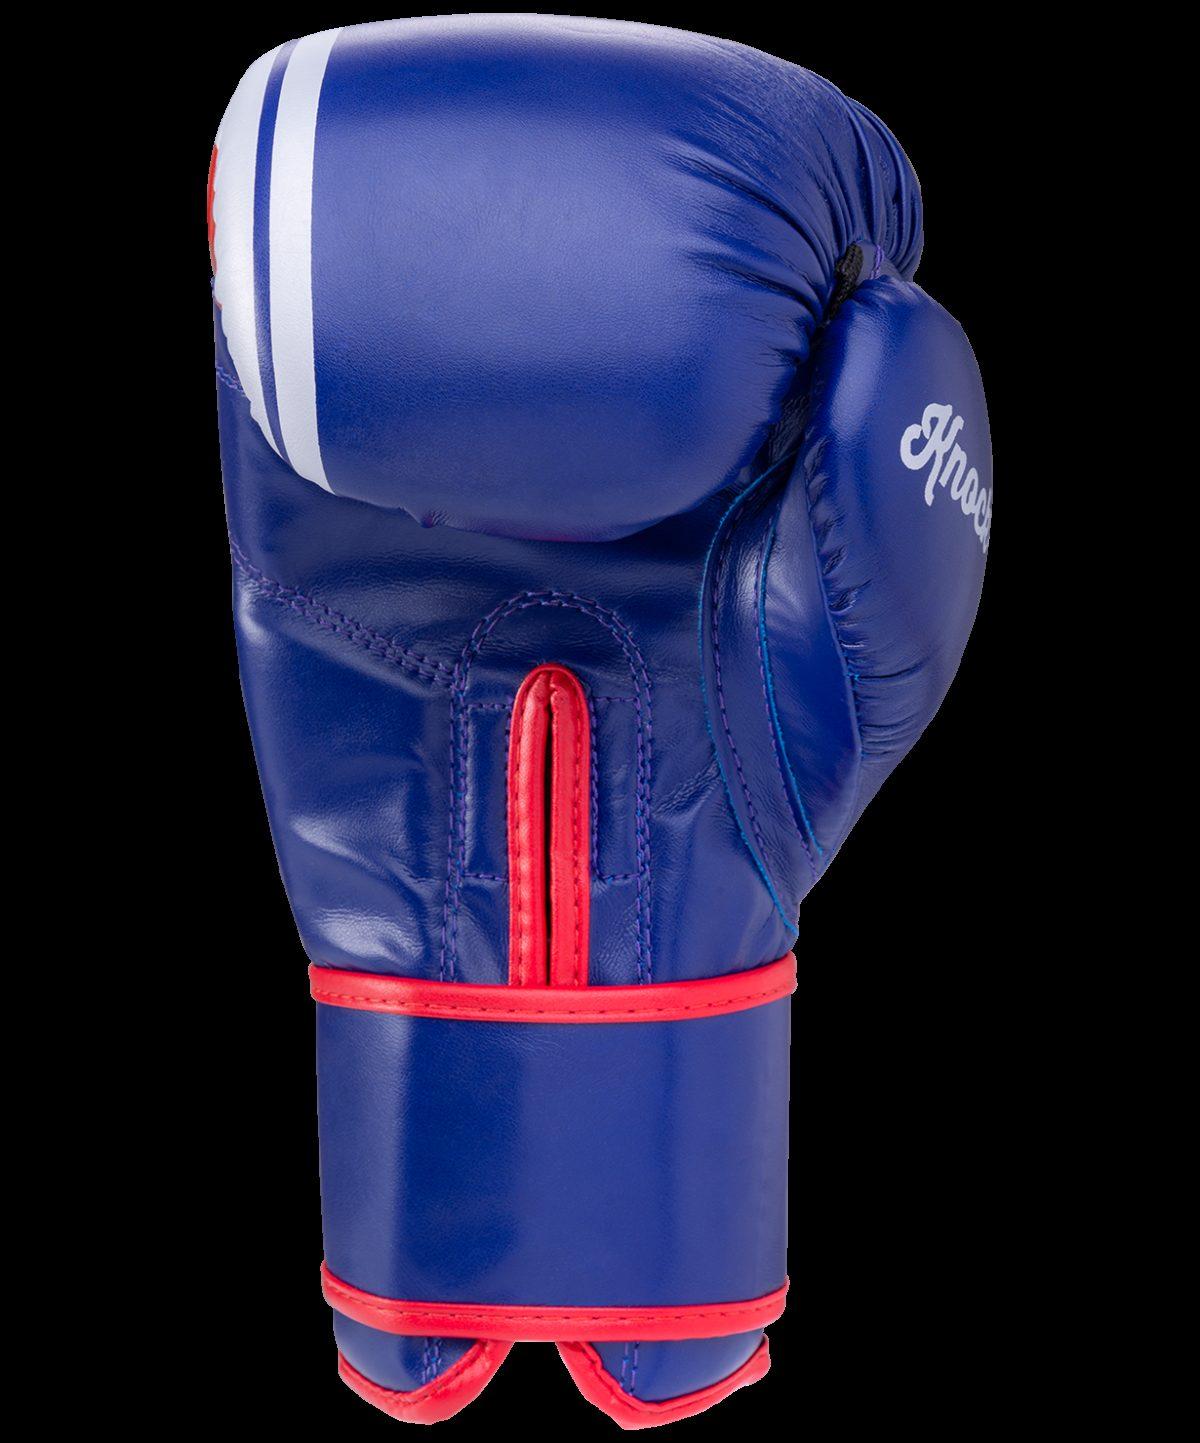 GREEN HILL Перчатки боксерские 10 oz Knockout  BGK-2266: синий - 2